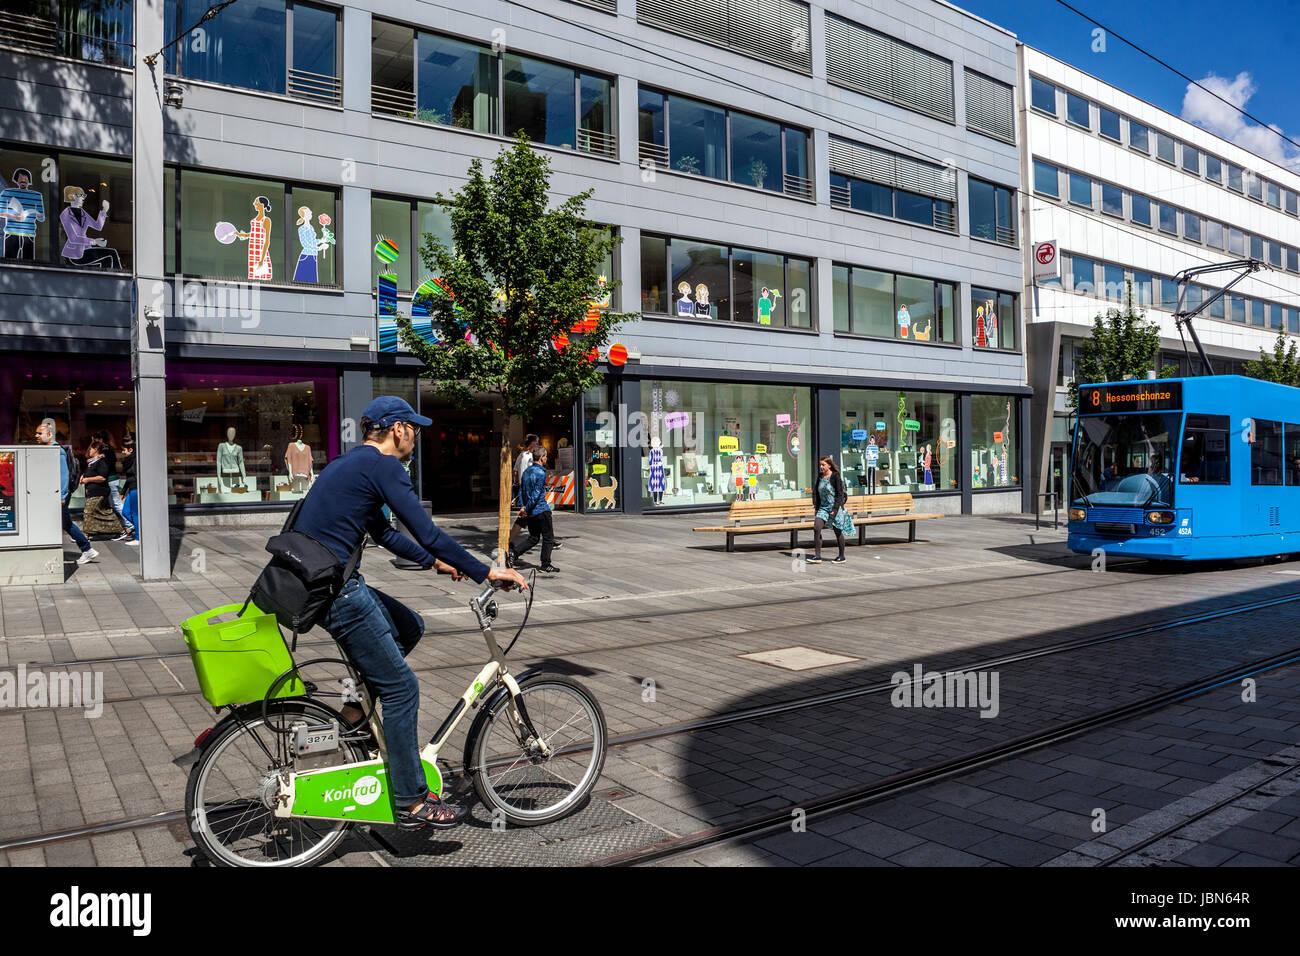 Konigstrasse. biker and tram, Kassel, Hessen, Germany - Stock Image